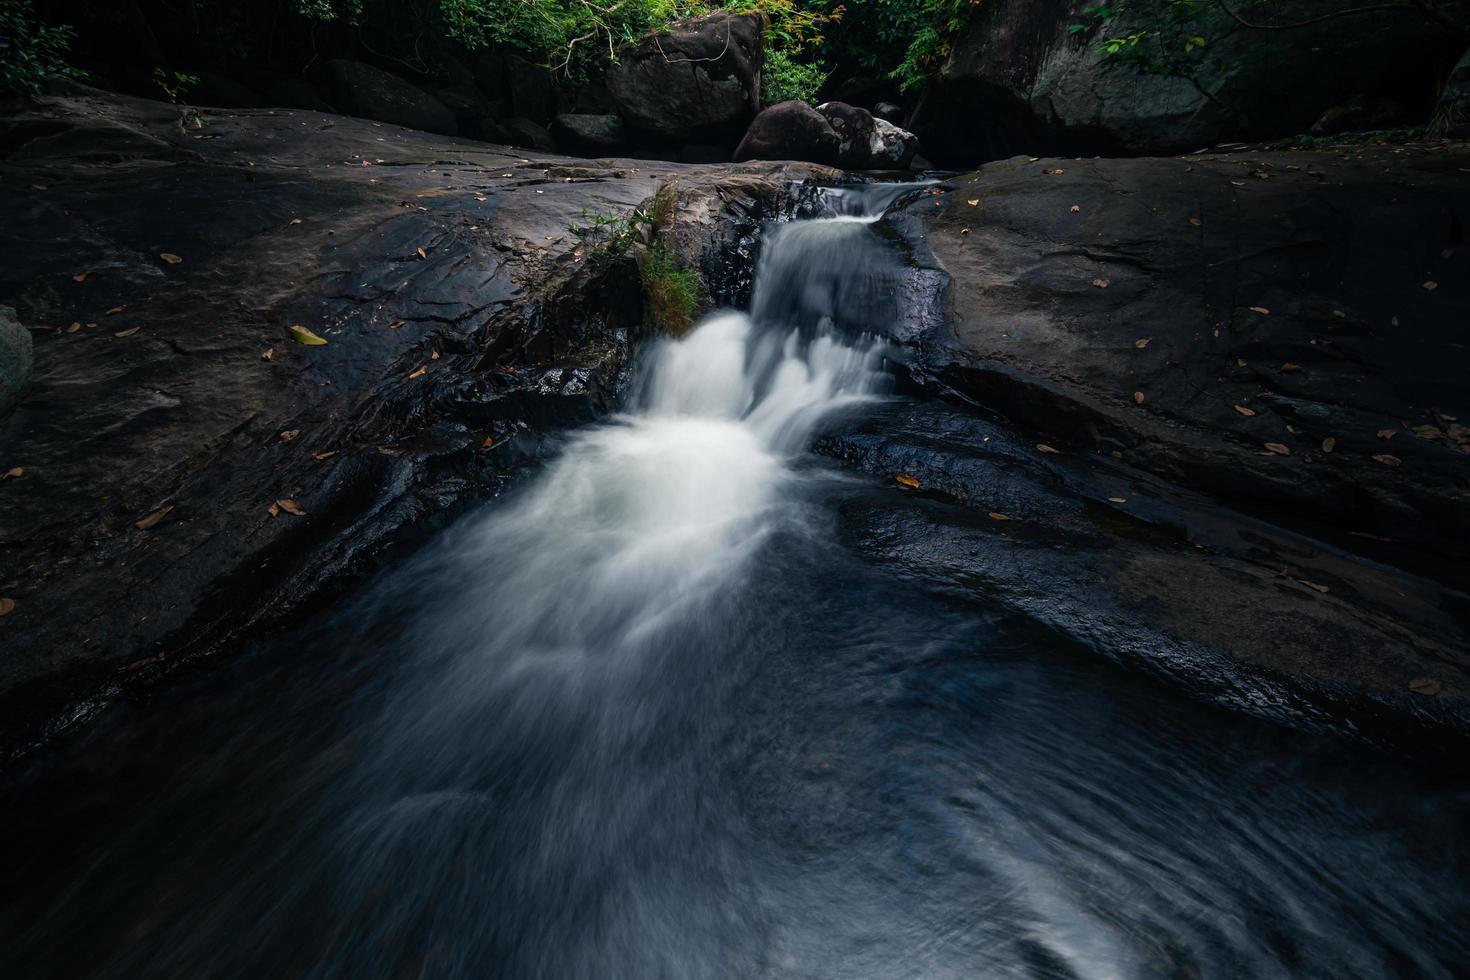 Ruisseau à la cascade de khlong pla kang en Thaïlande photo